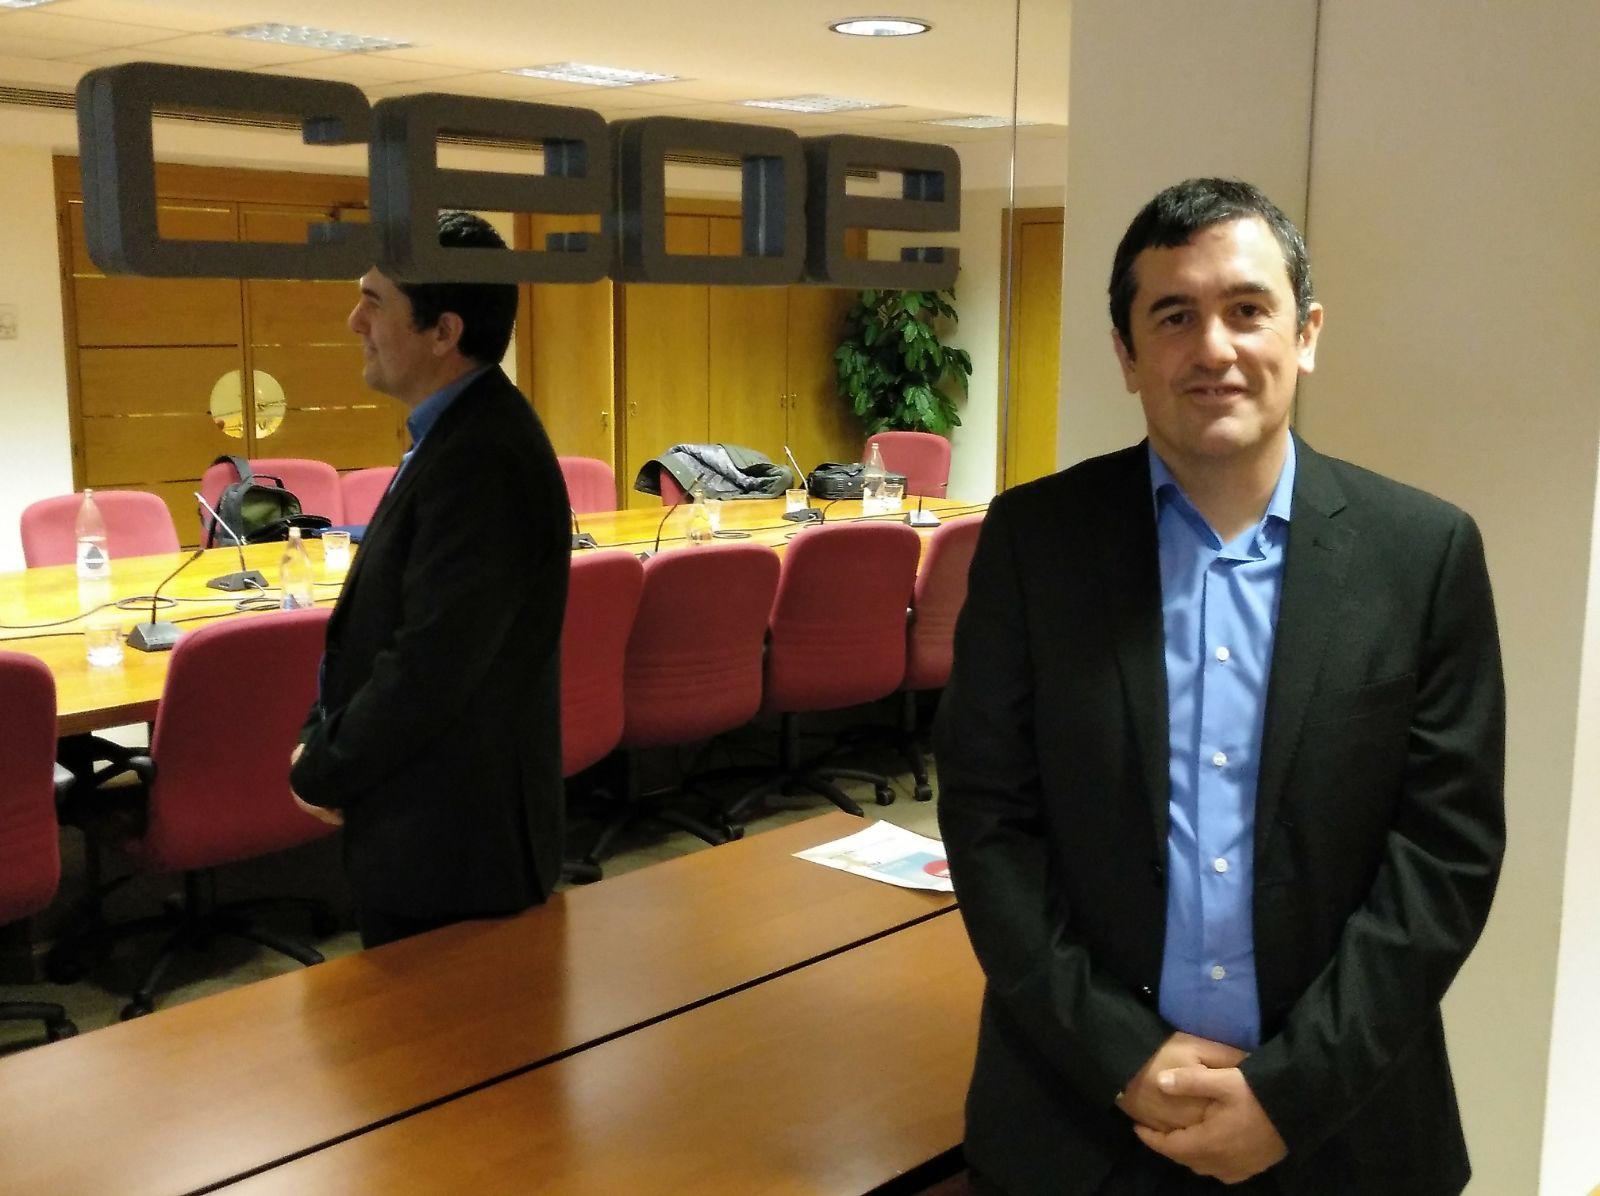 THE TEACHER OF EU MEDITERRANI DR. ÓSCAR GUTIÉRREZ OBTAINS ANECA ACCREDITATION